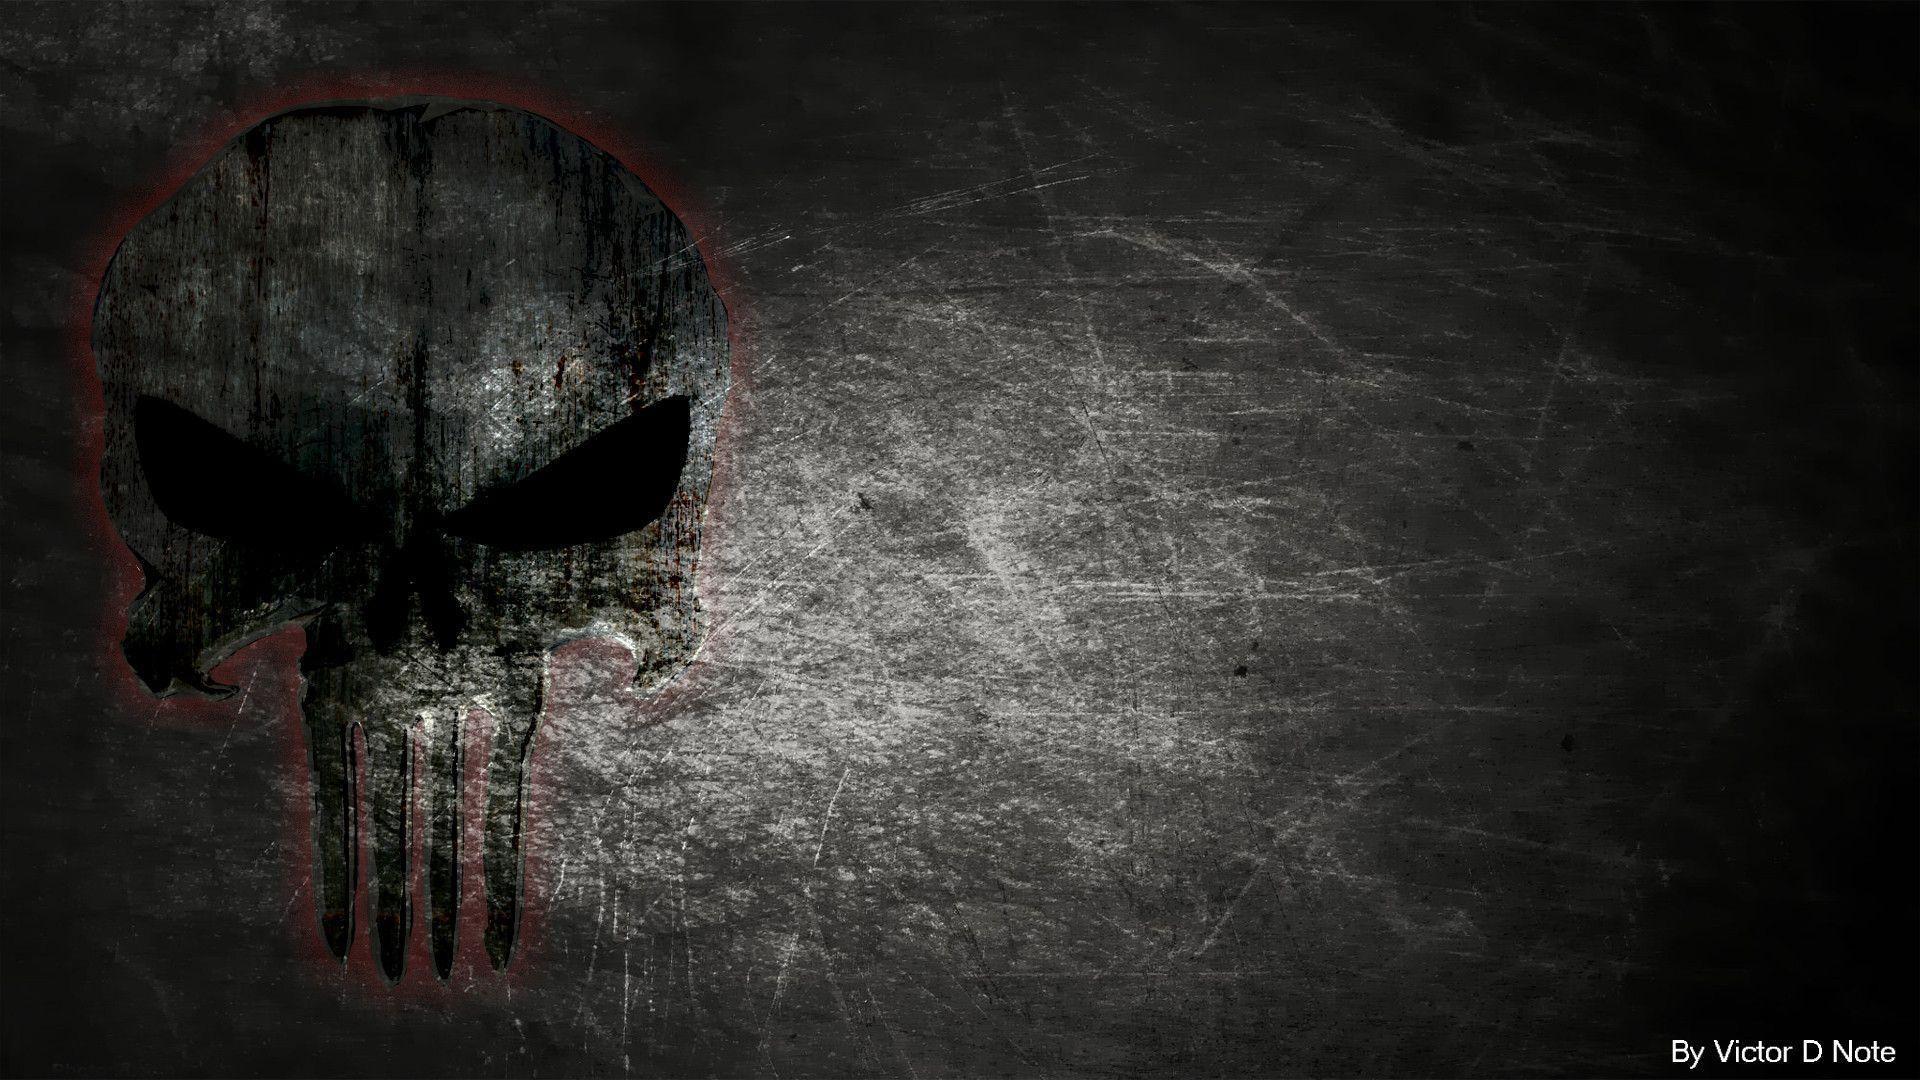 Marvel The <b>Punisher Wallpaper</b> – WallpaperSafari